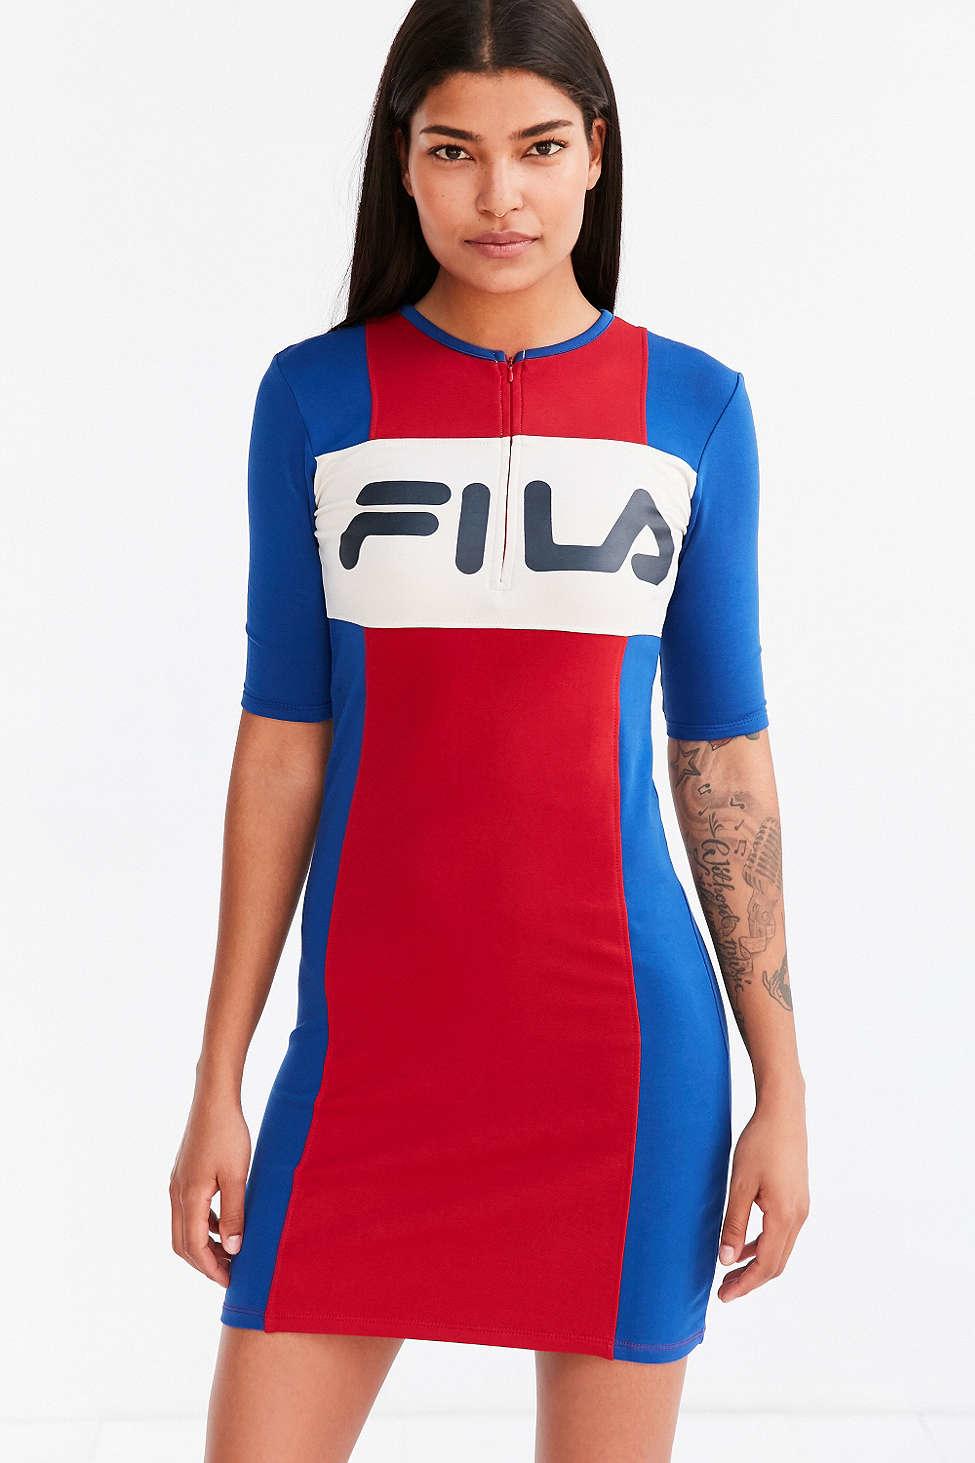 Kiki clothing dresses images